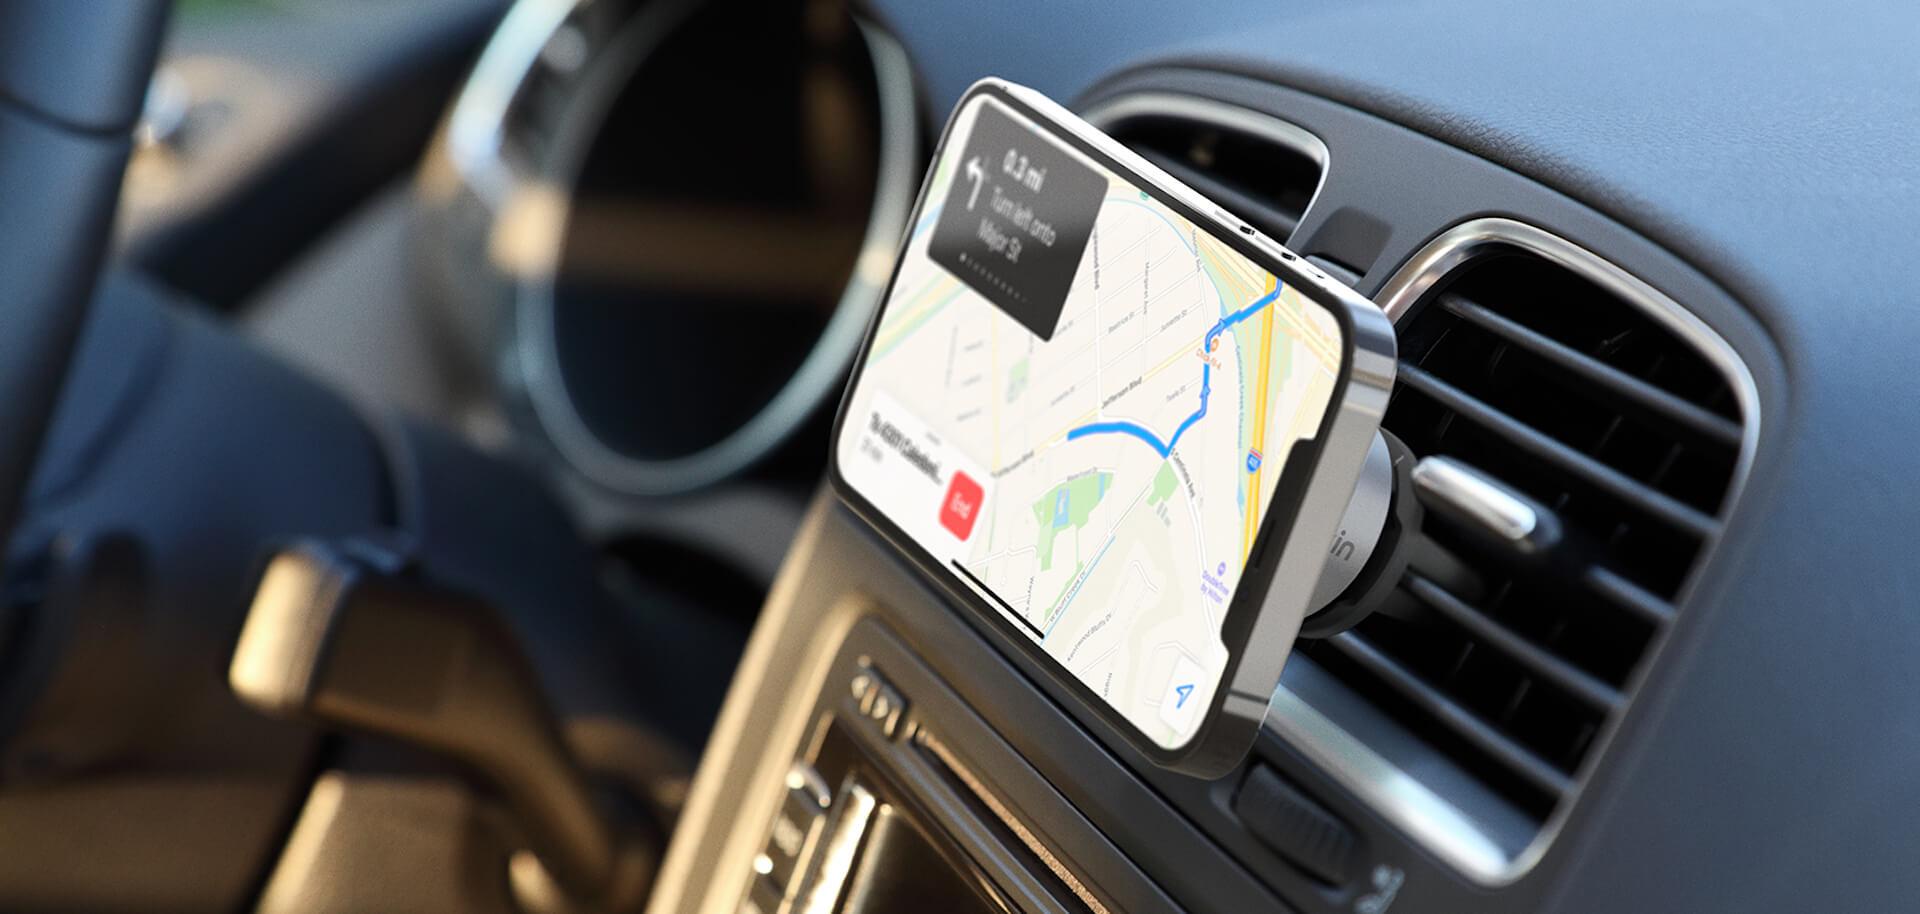 BelkinからiPhone 12シリーズに対応した高機能製品3点が発売!MagSafeを利用した3-in-1のワイヤレス充電器などが登場 tech210120_magsafe_belkin_2